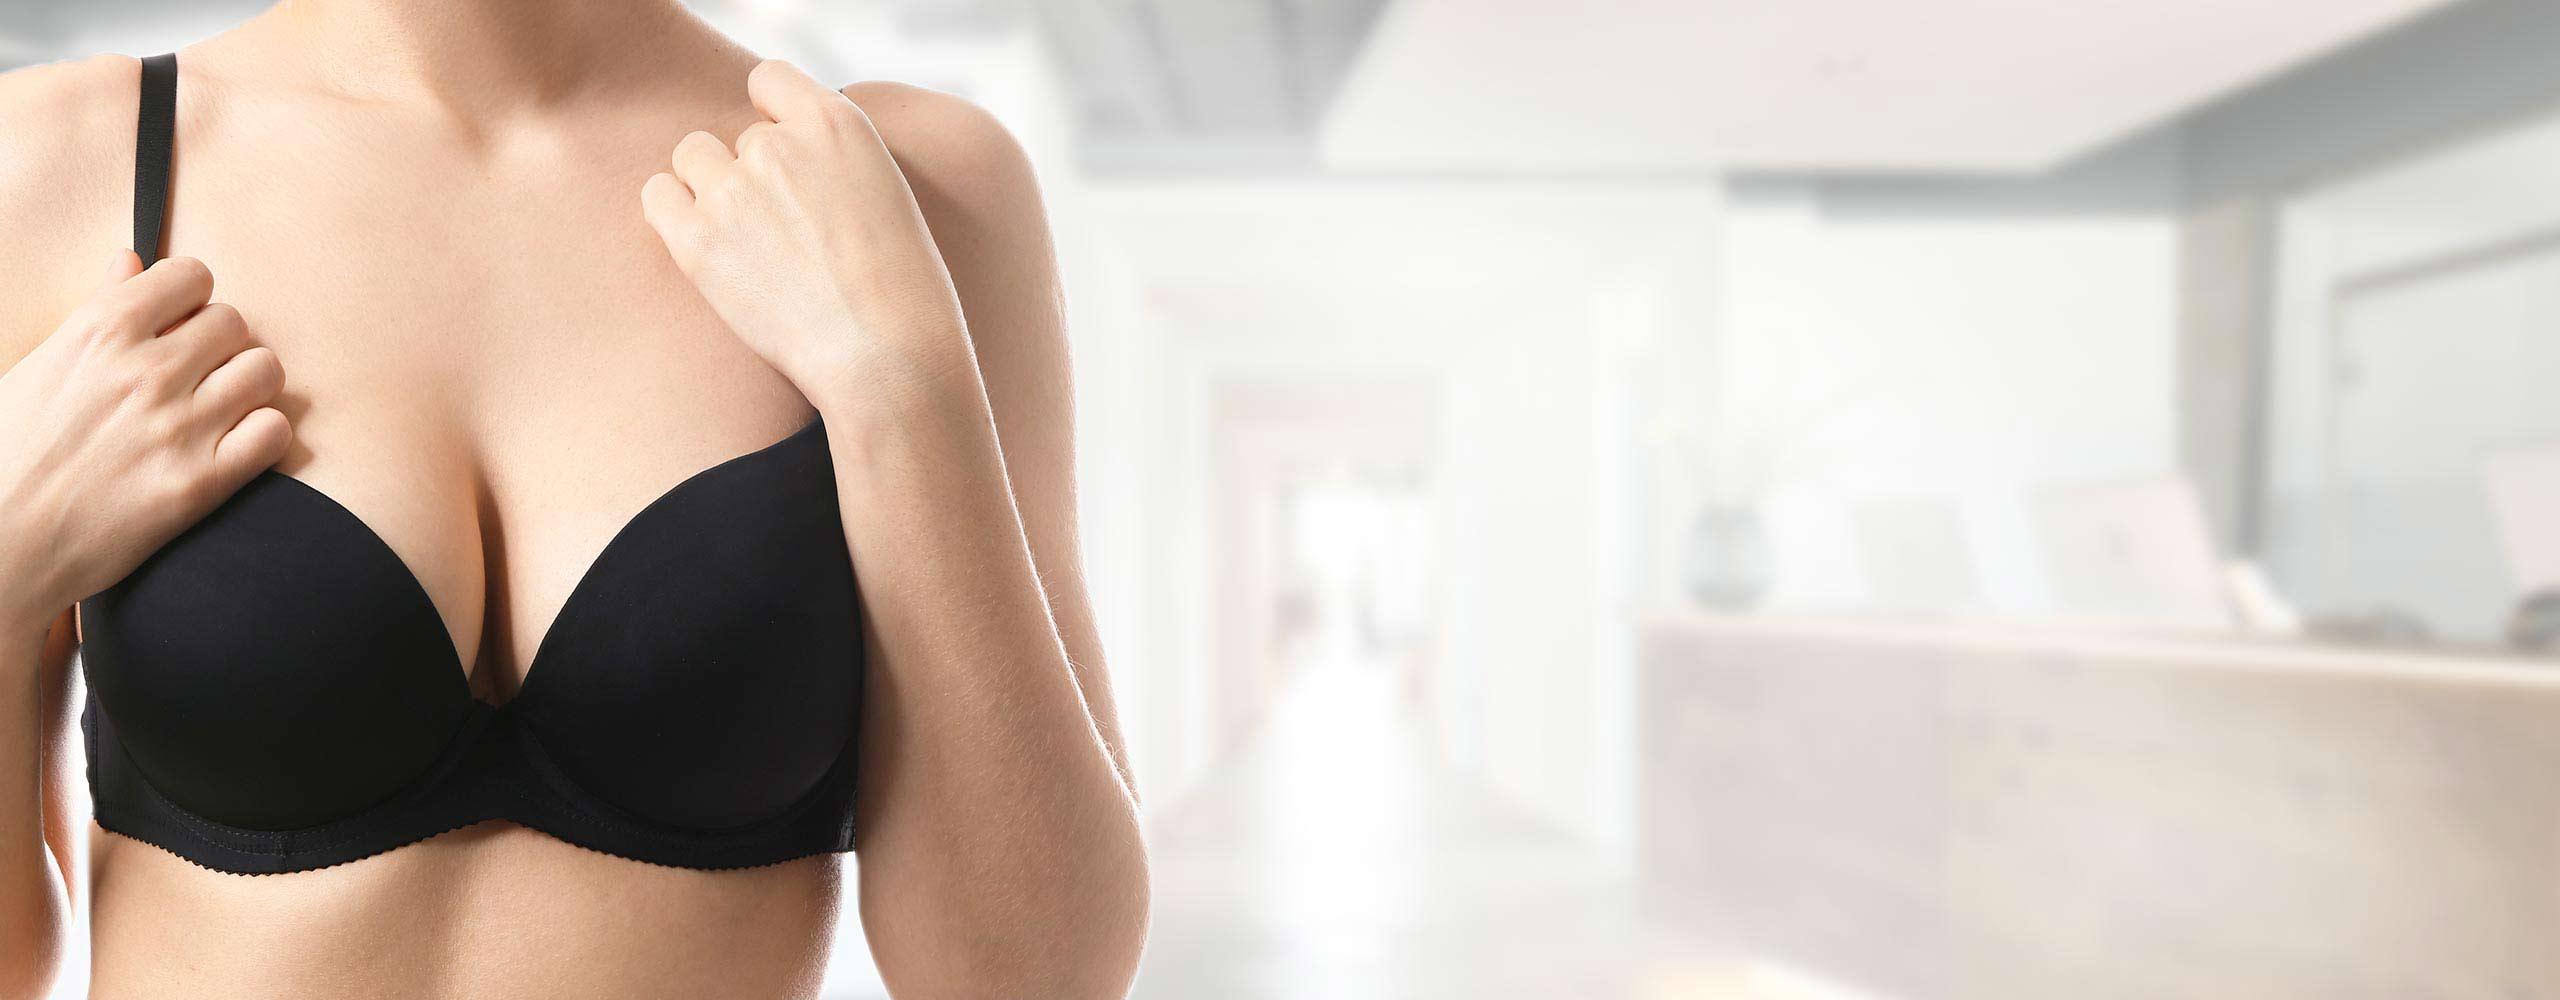 brustvergroesserung schoenheitsklinik proaesthetic header 1